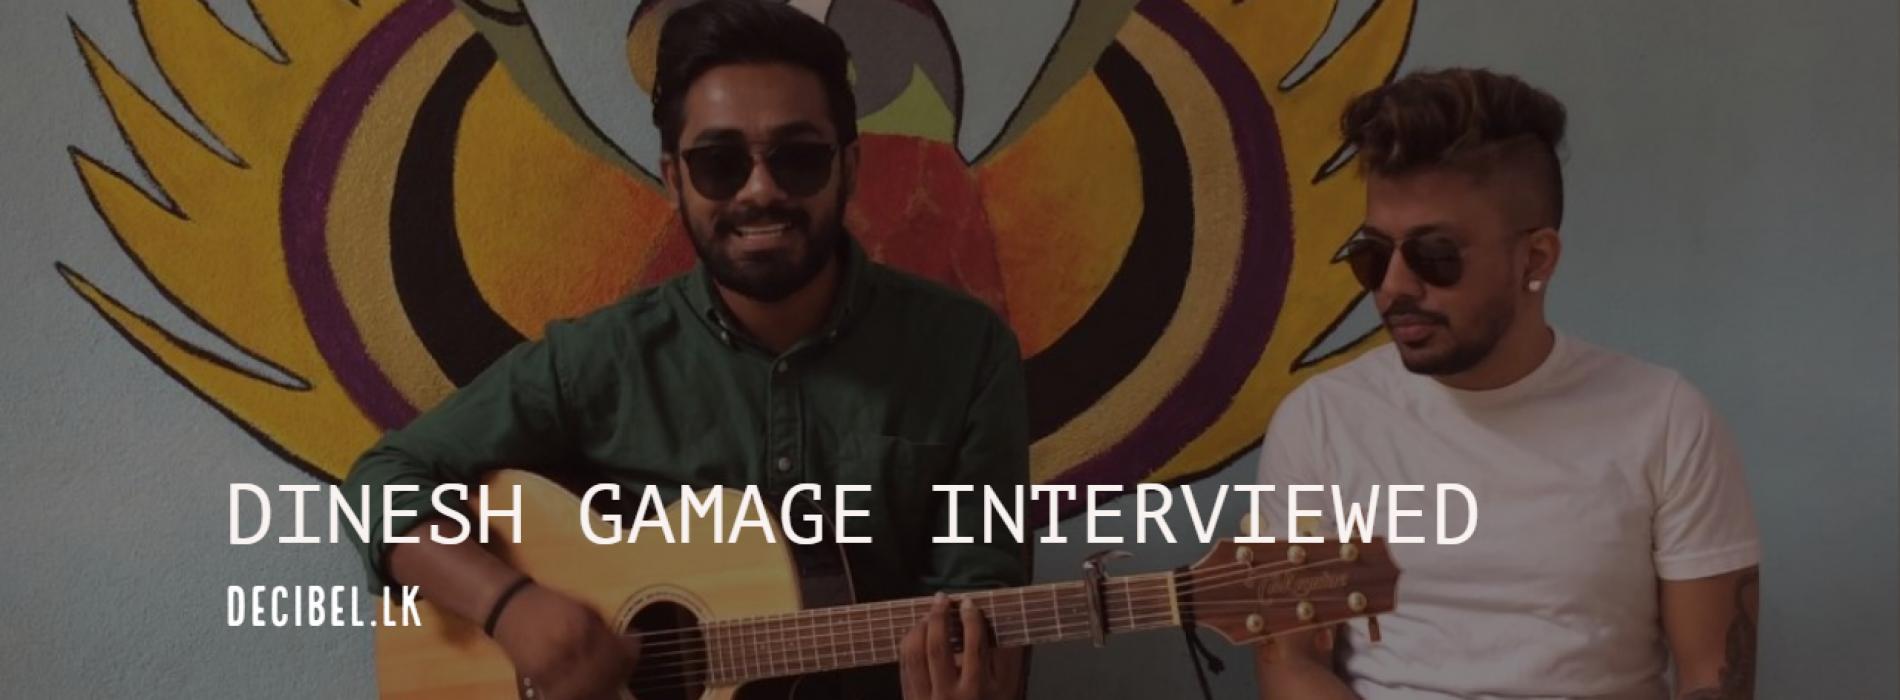 Dinesh Gamage Gets Interviewed